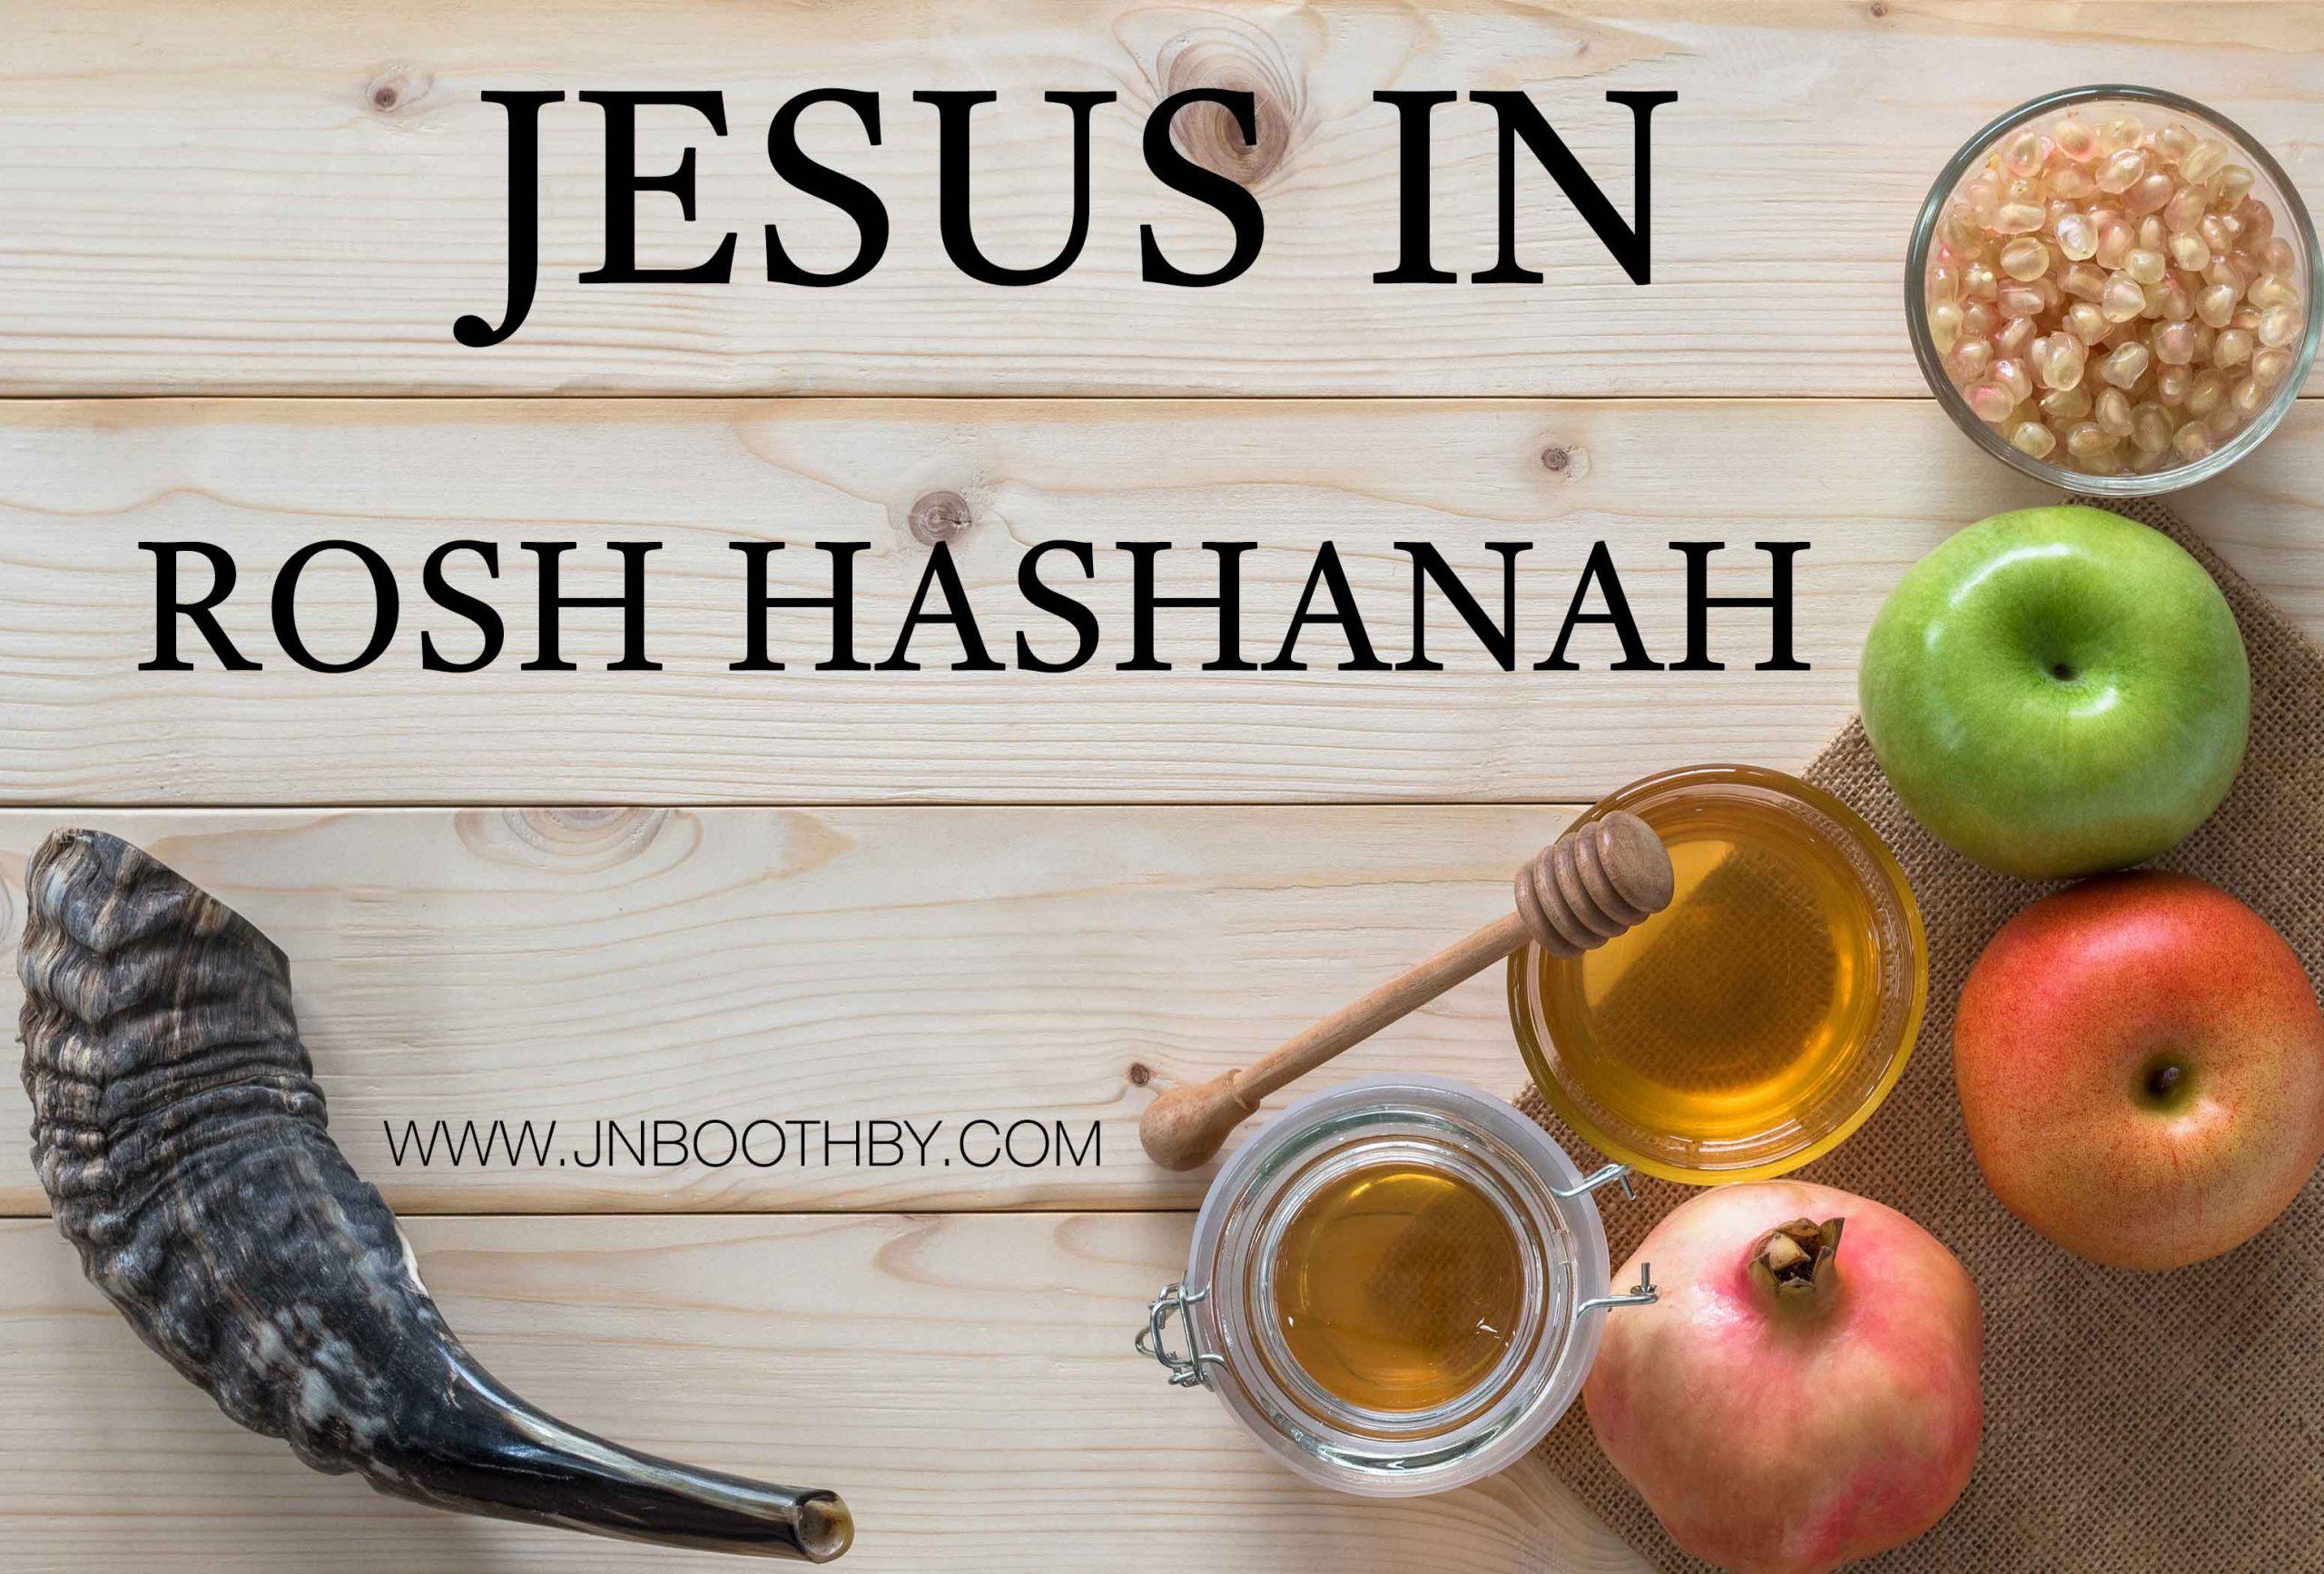 Jesus in Rosh Hashanah